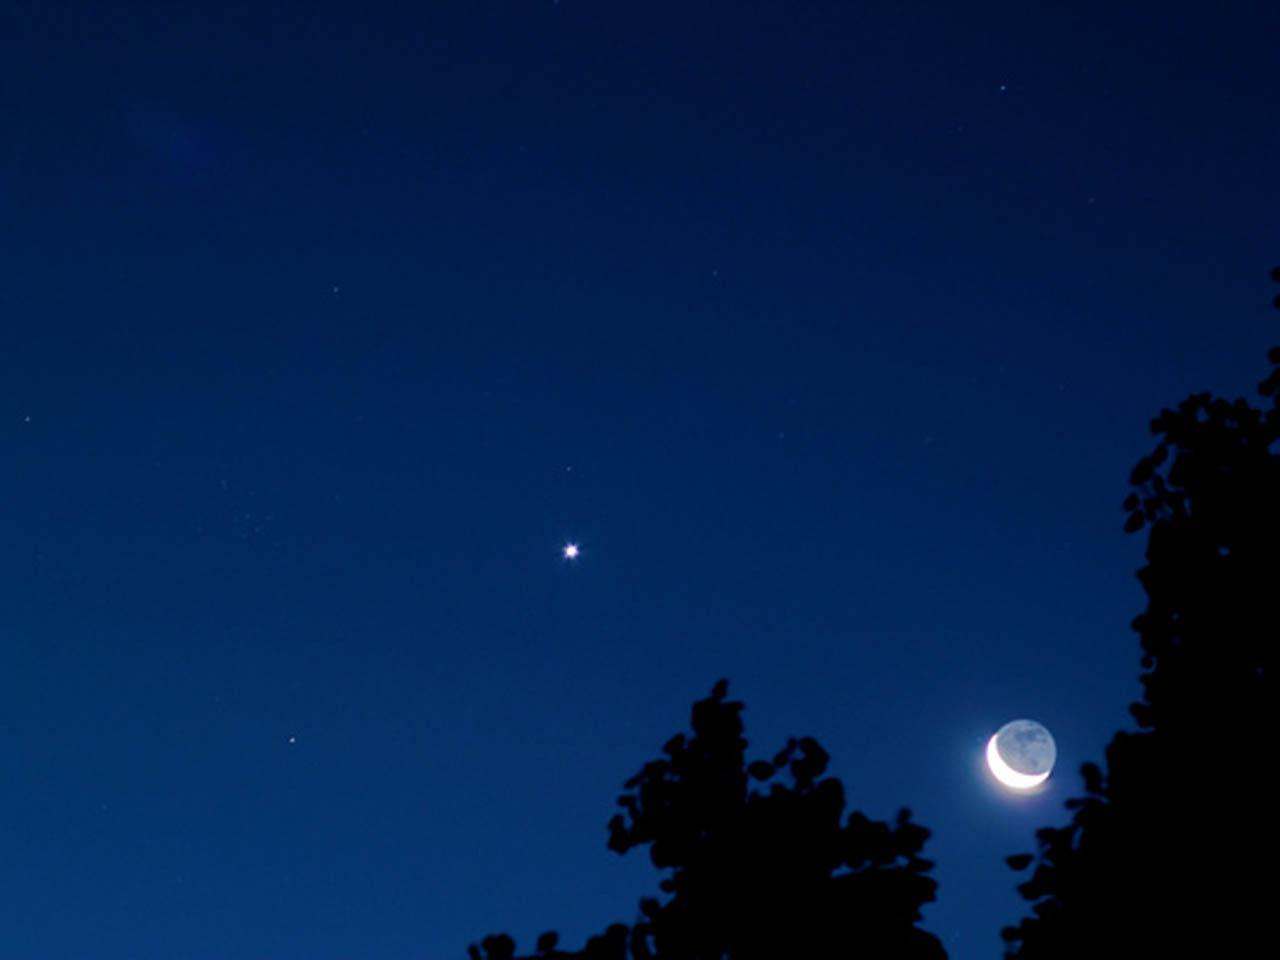 Bright Venus and moon shine in Friday morning sky - CBS News